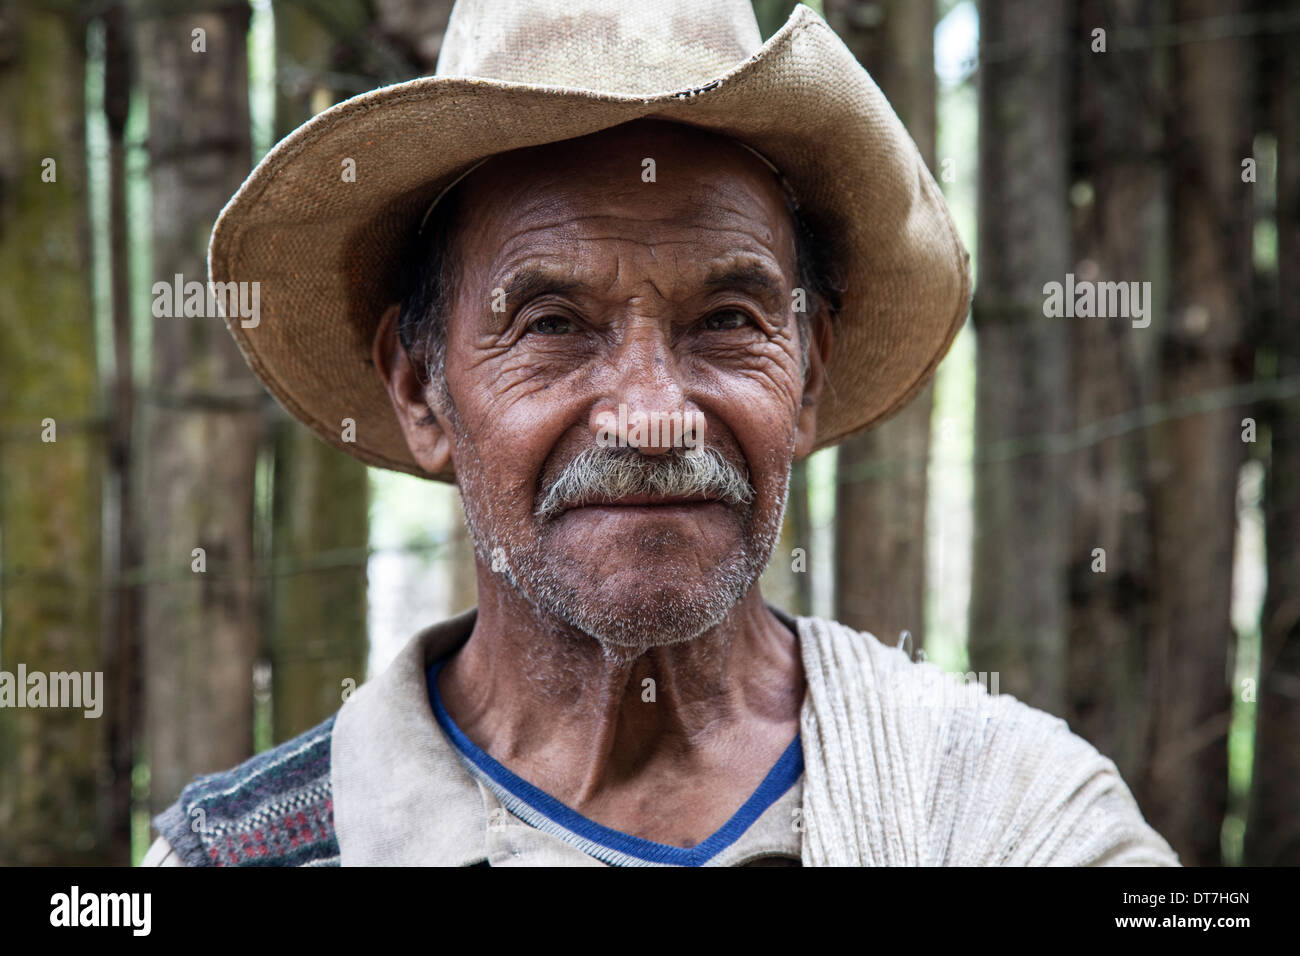 Portrait of Guatemalan peasant - Stock Image